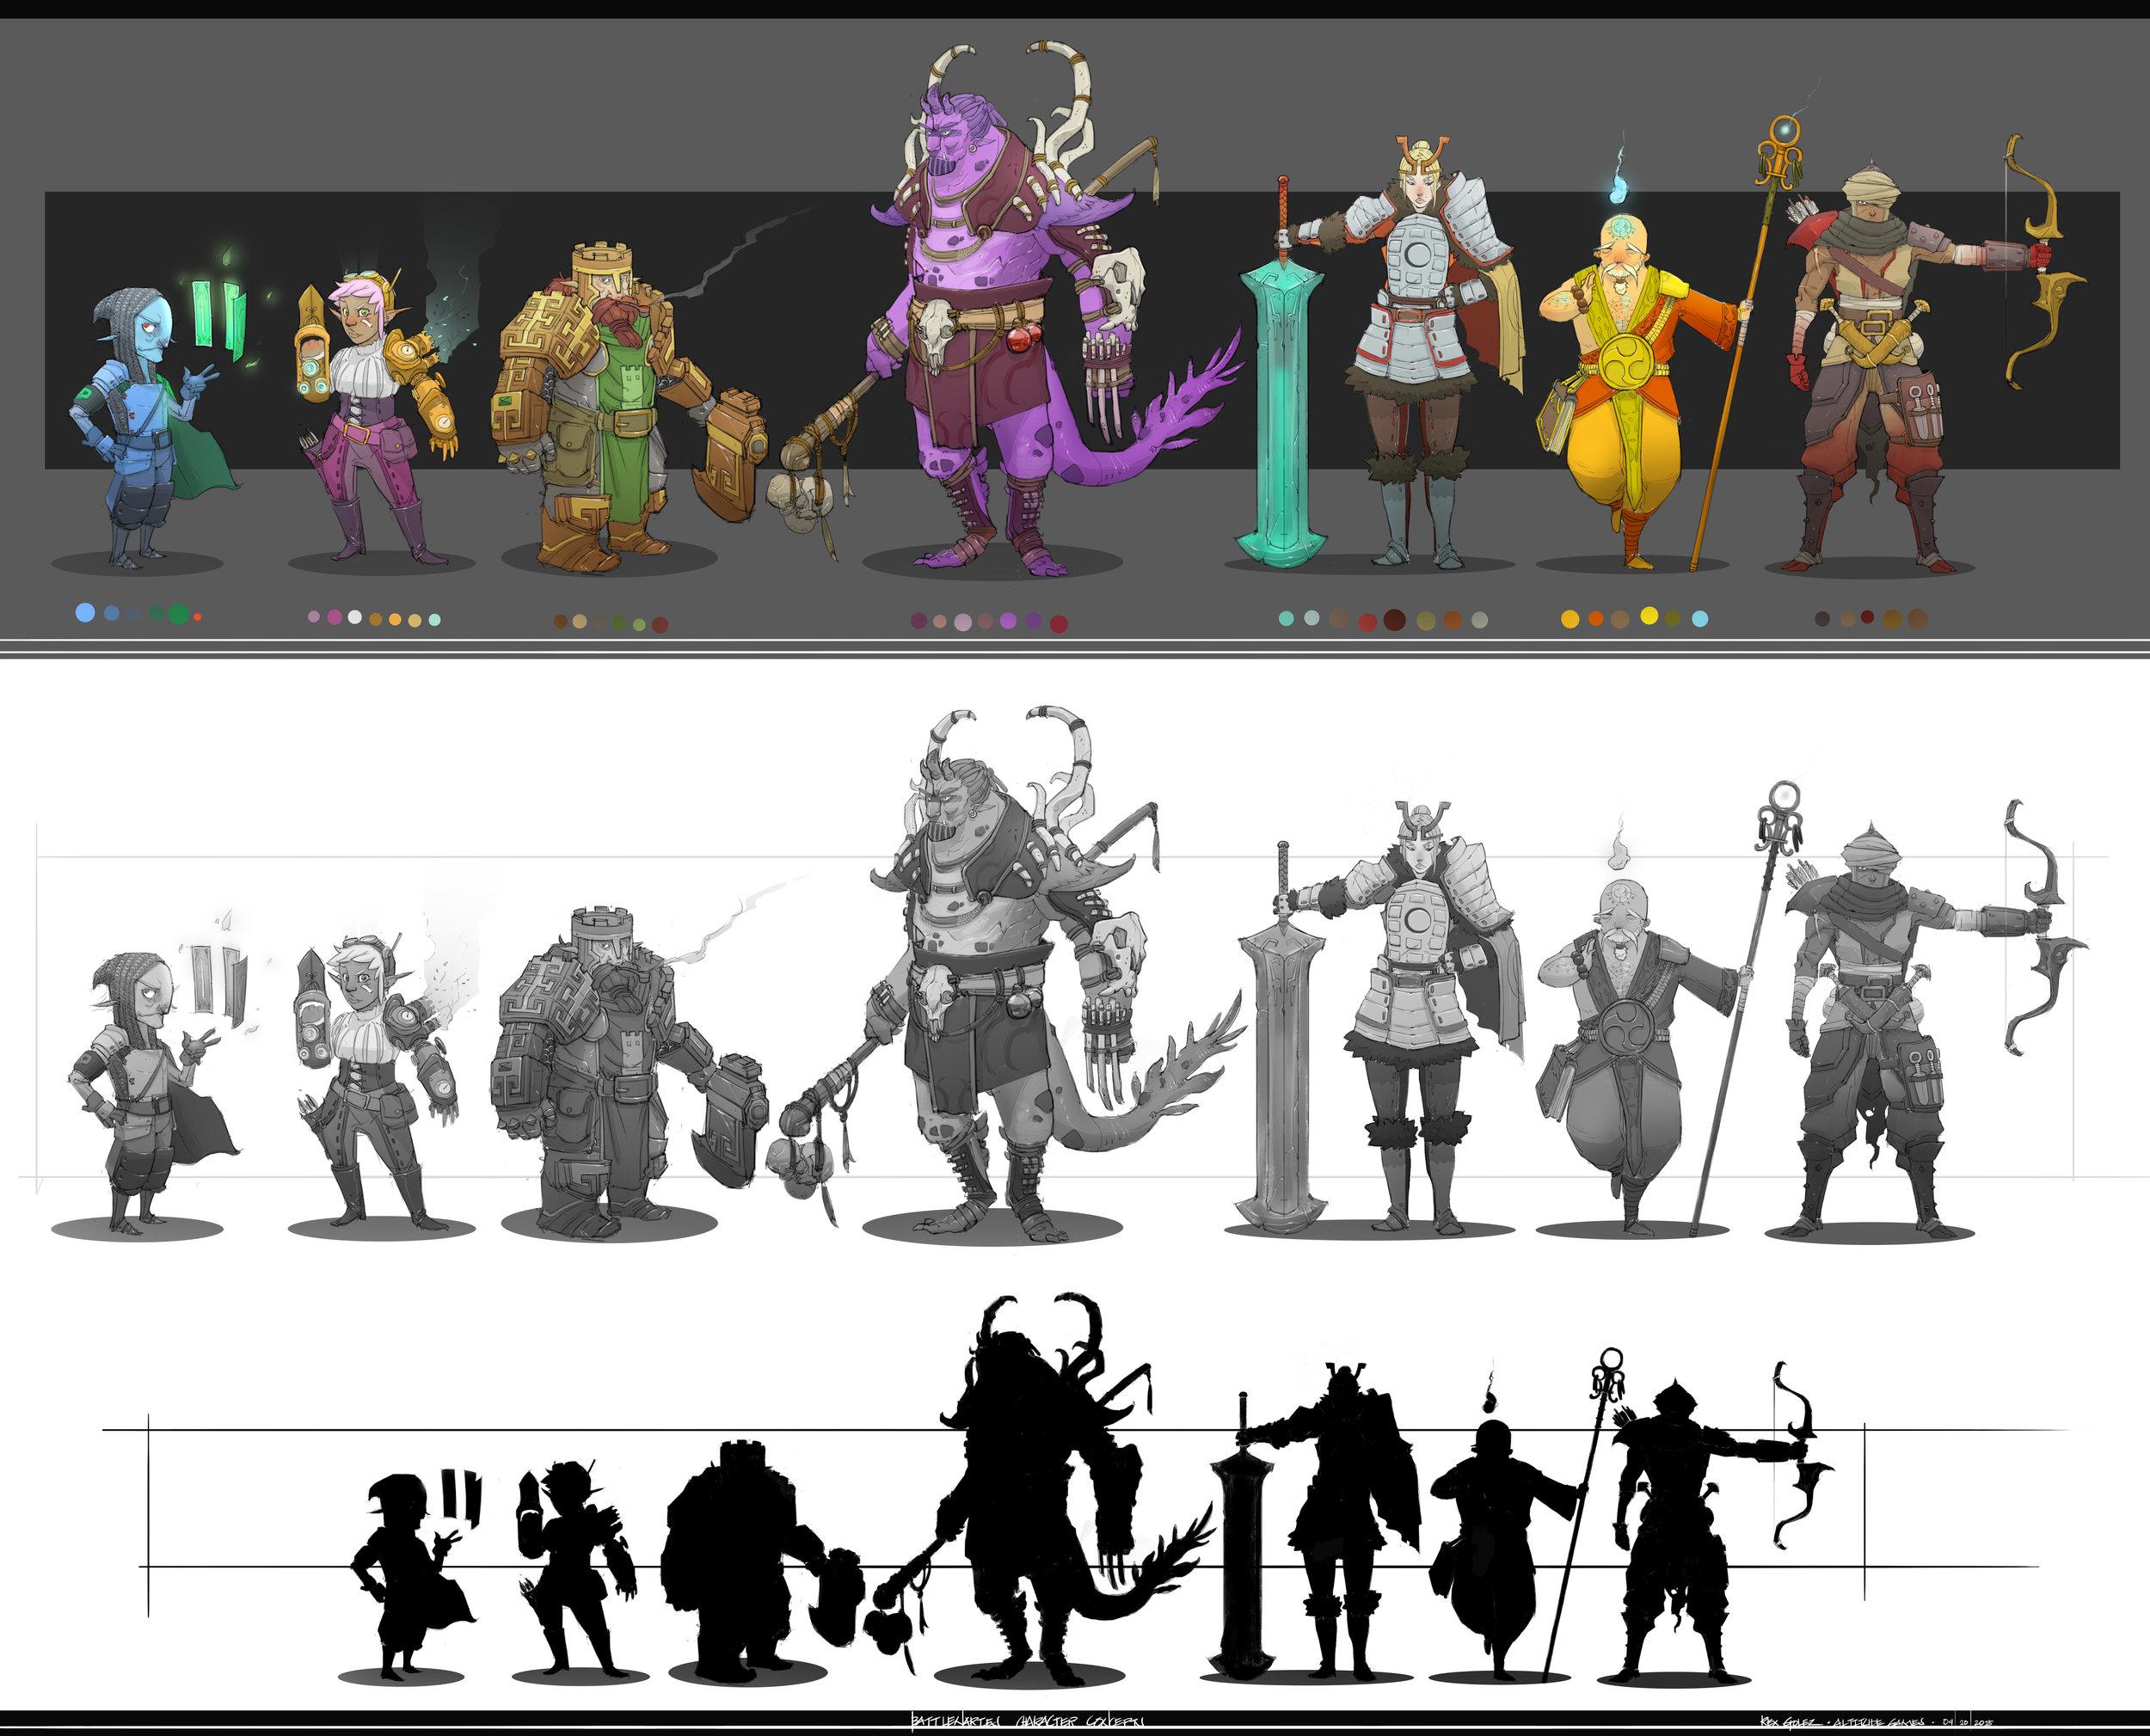 Battlenaries_Color_Exploration_Values_Silhouettes.jpg